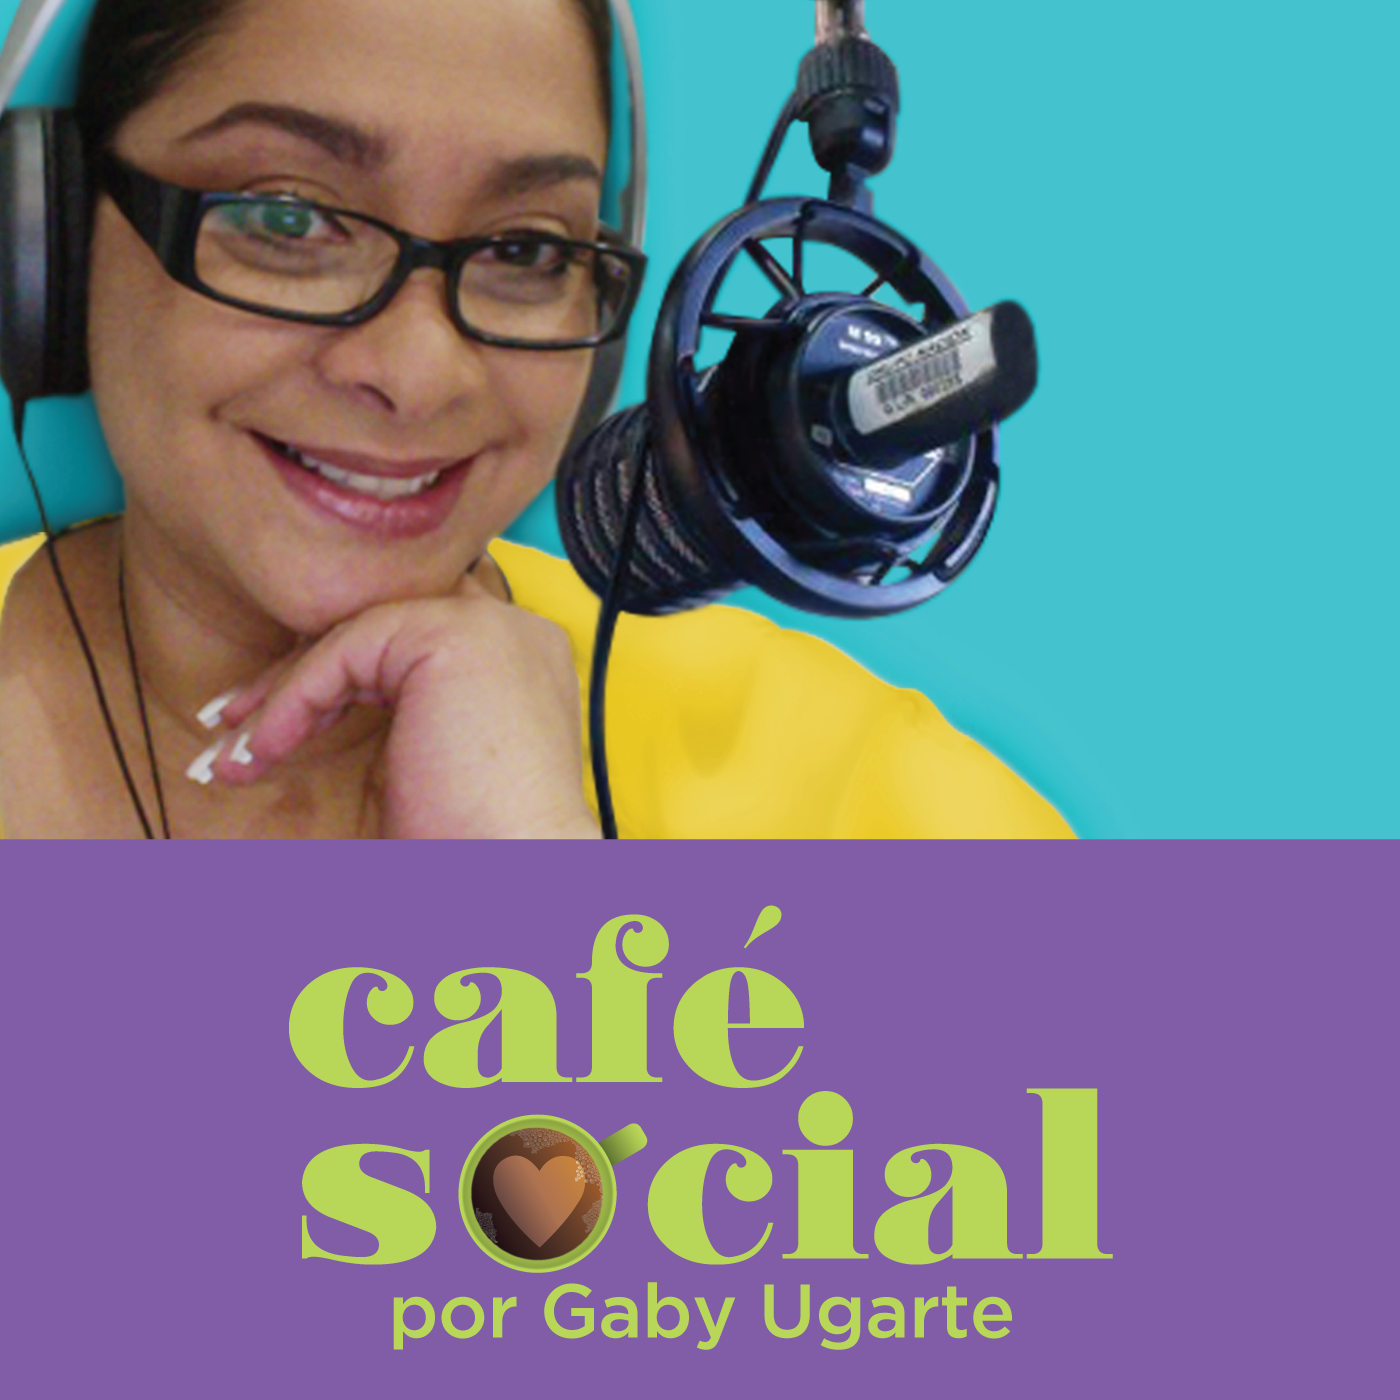 Café Social   Podcast de social media, emprendimiento digital y marca personal para comunicadores. show art